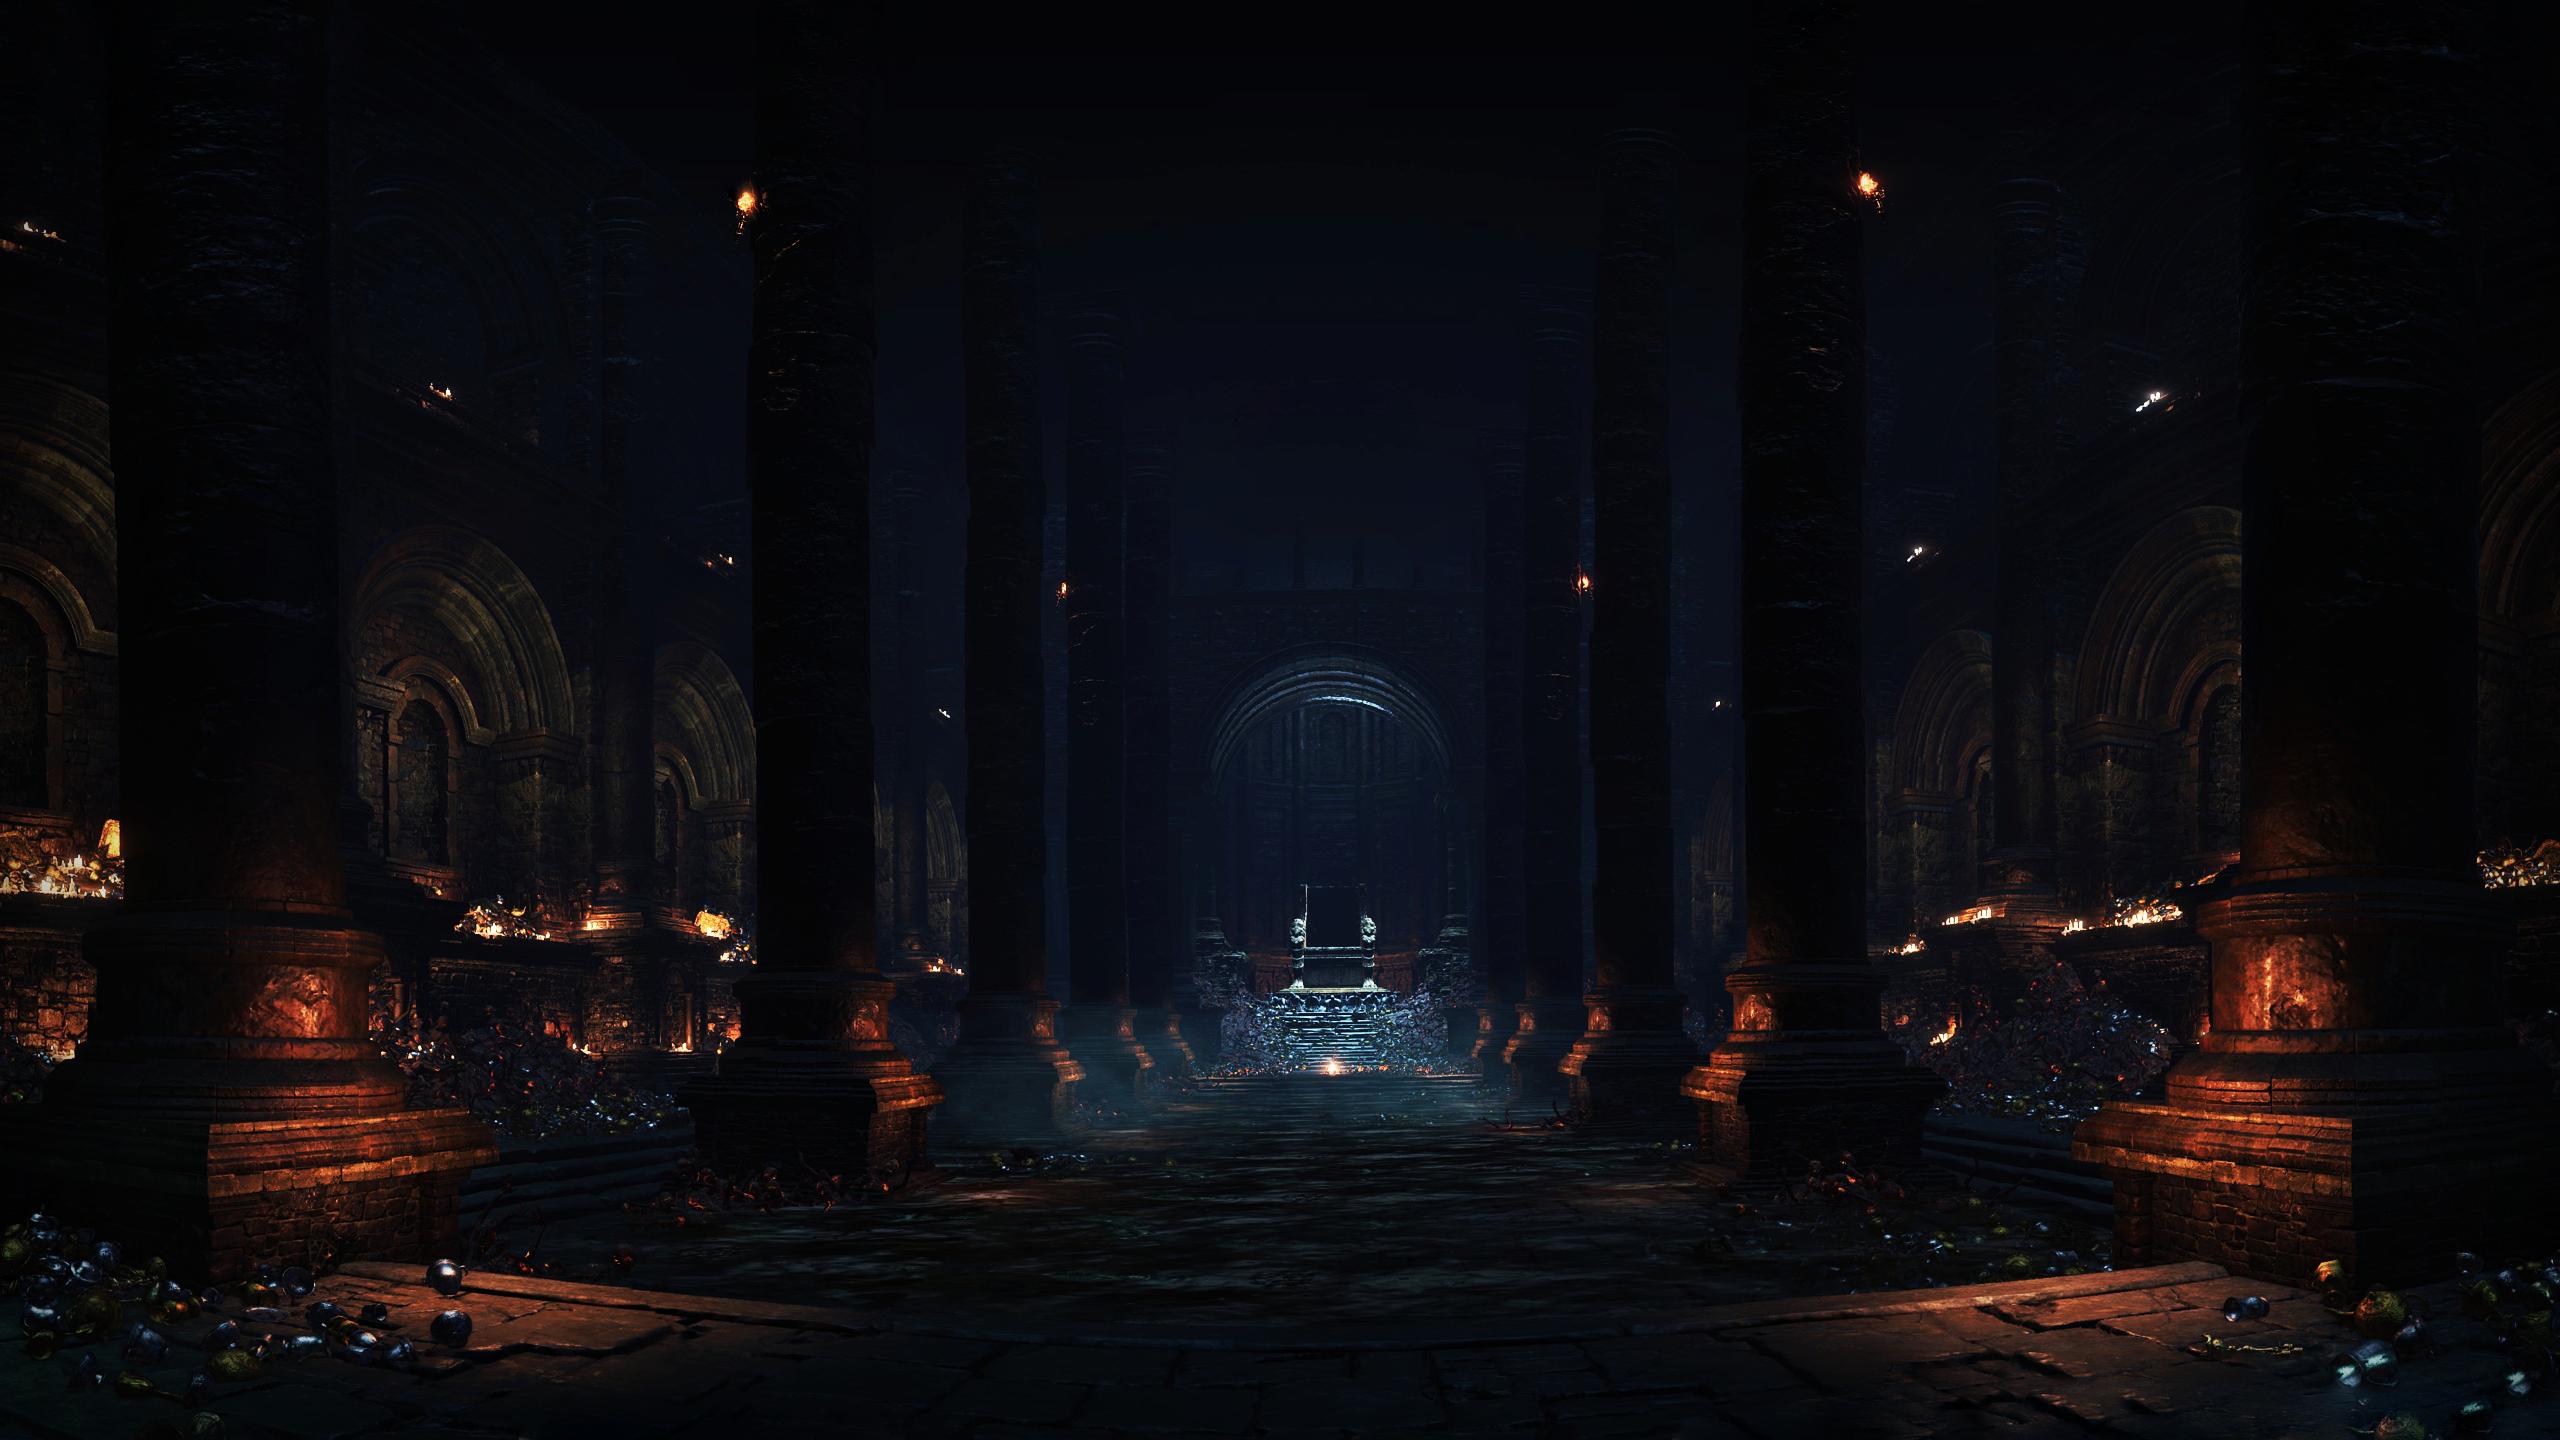 Amazing Wallpaper Night Evening - video-games-night-evening-Dark-Souls-III-midnight-Yhorm-the-Giant-Profaned-Capital-light-lighting-darkness-screenshot-33217  Trends-38774.png